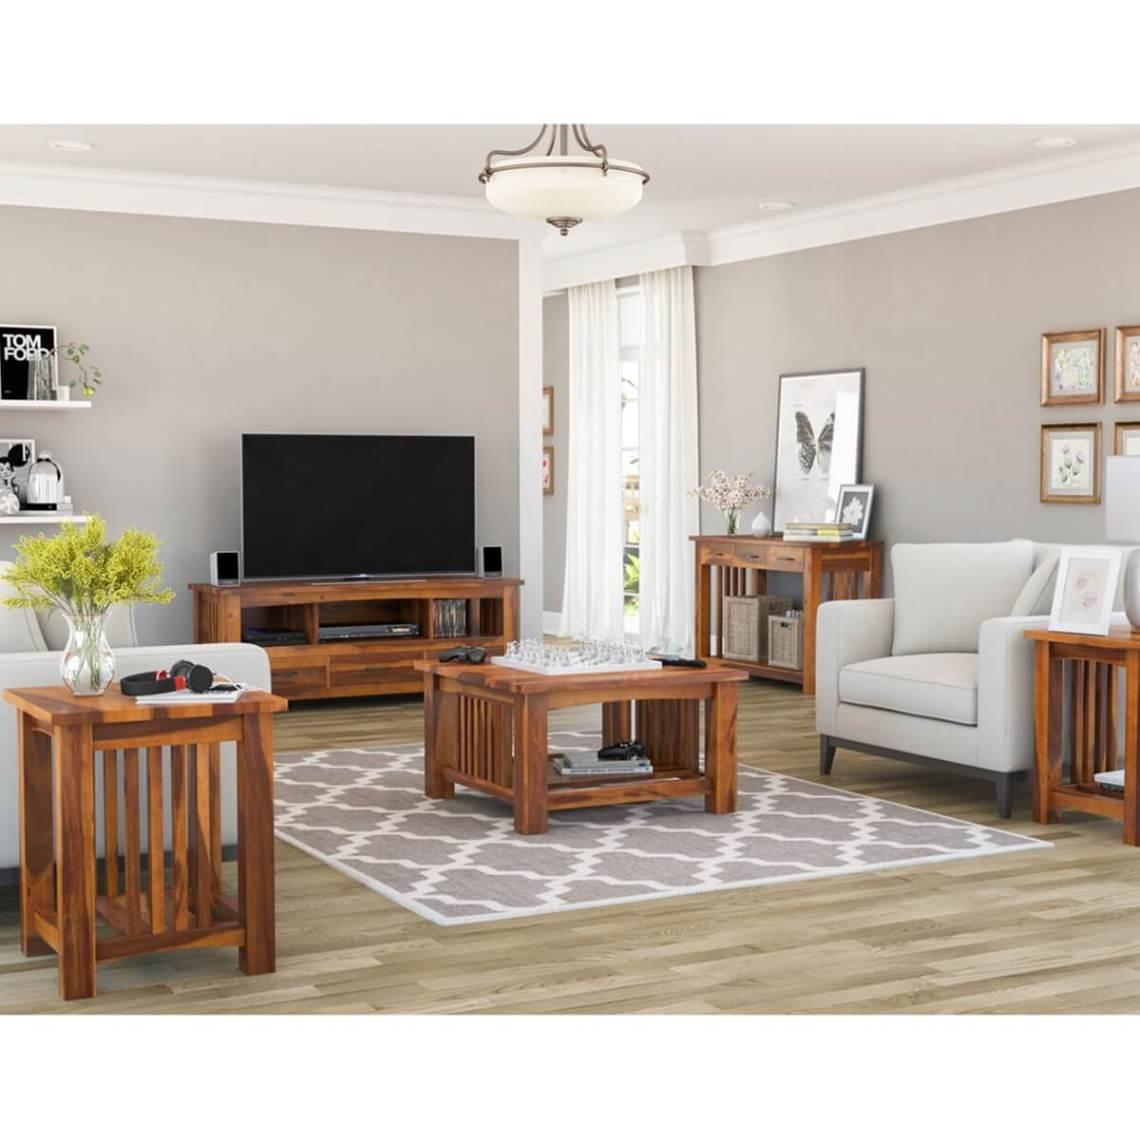 Jeddito Mission Rustic Solid Wood 5 Piece Living Room Set